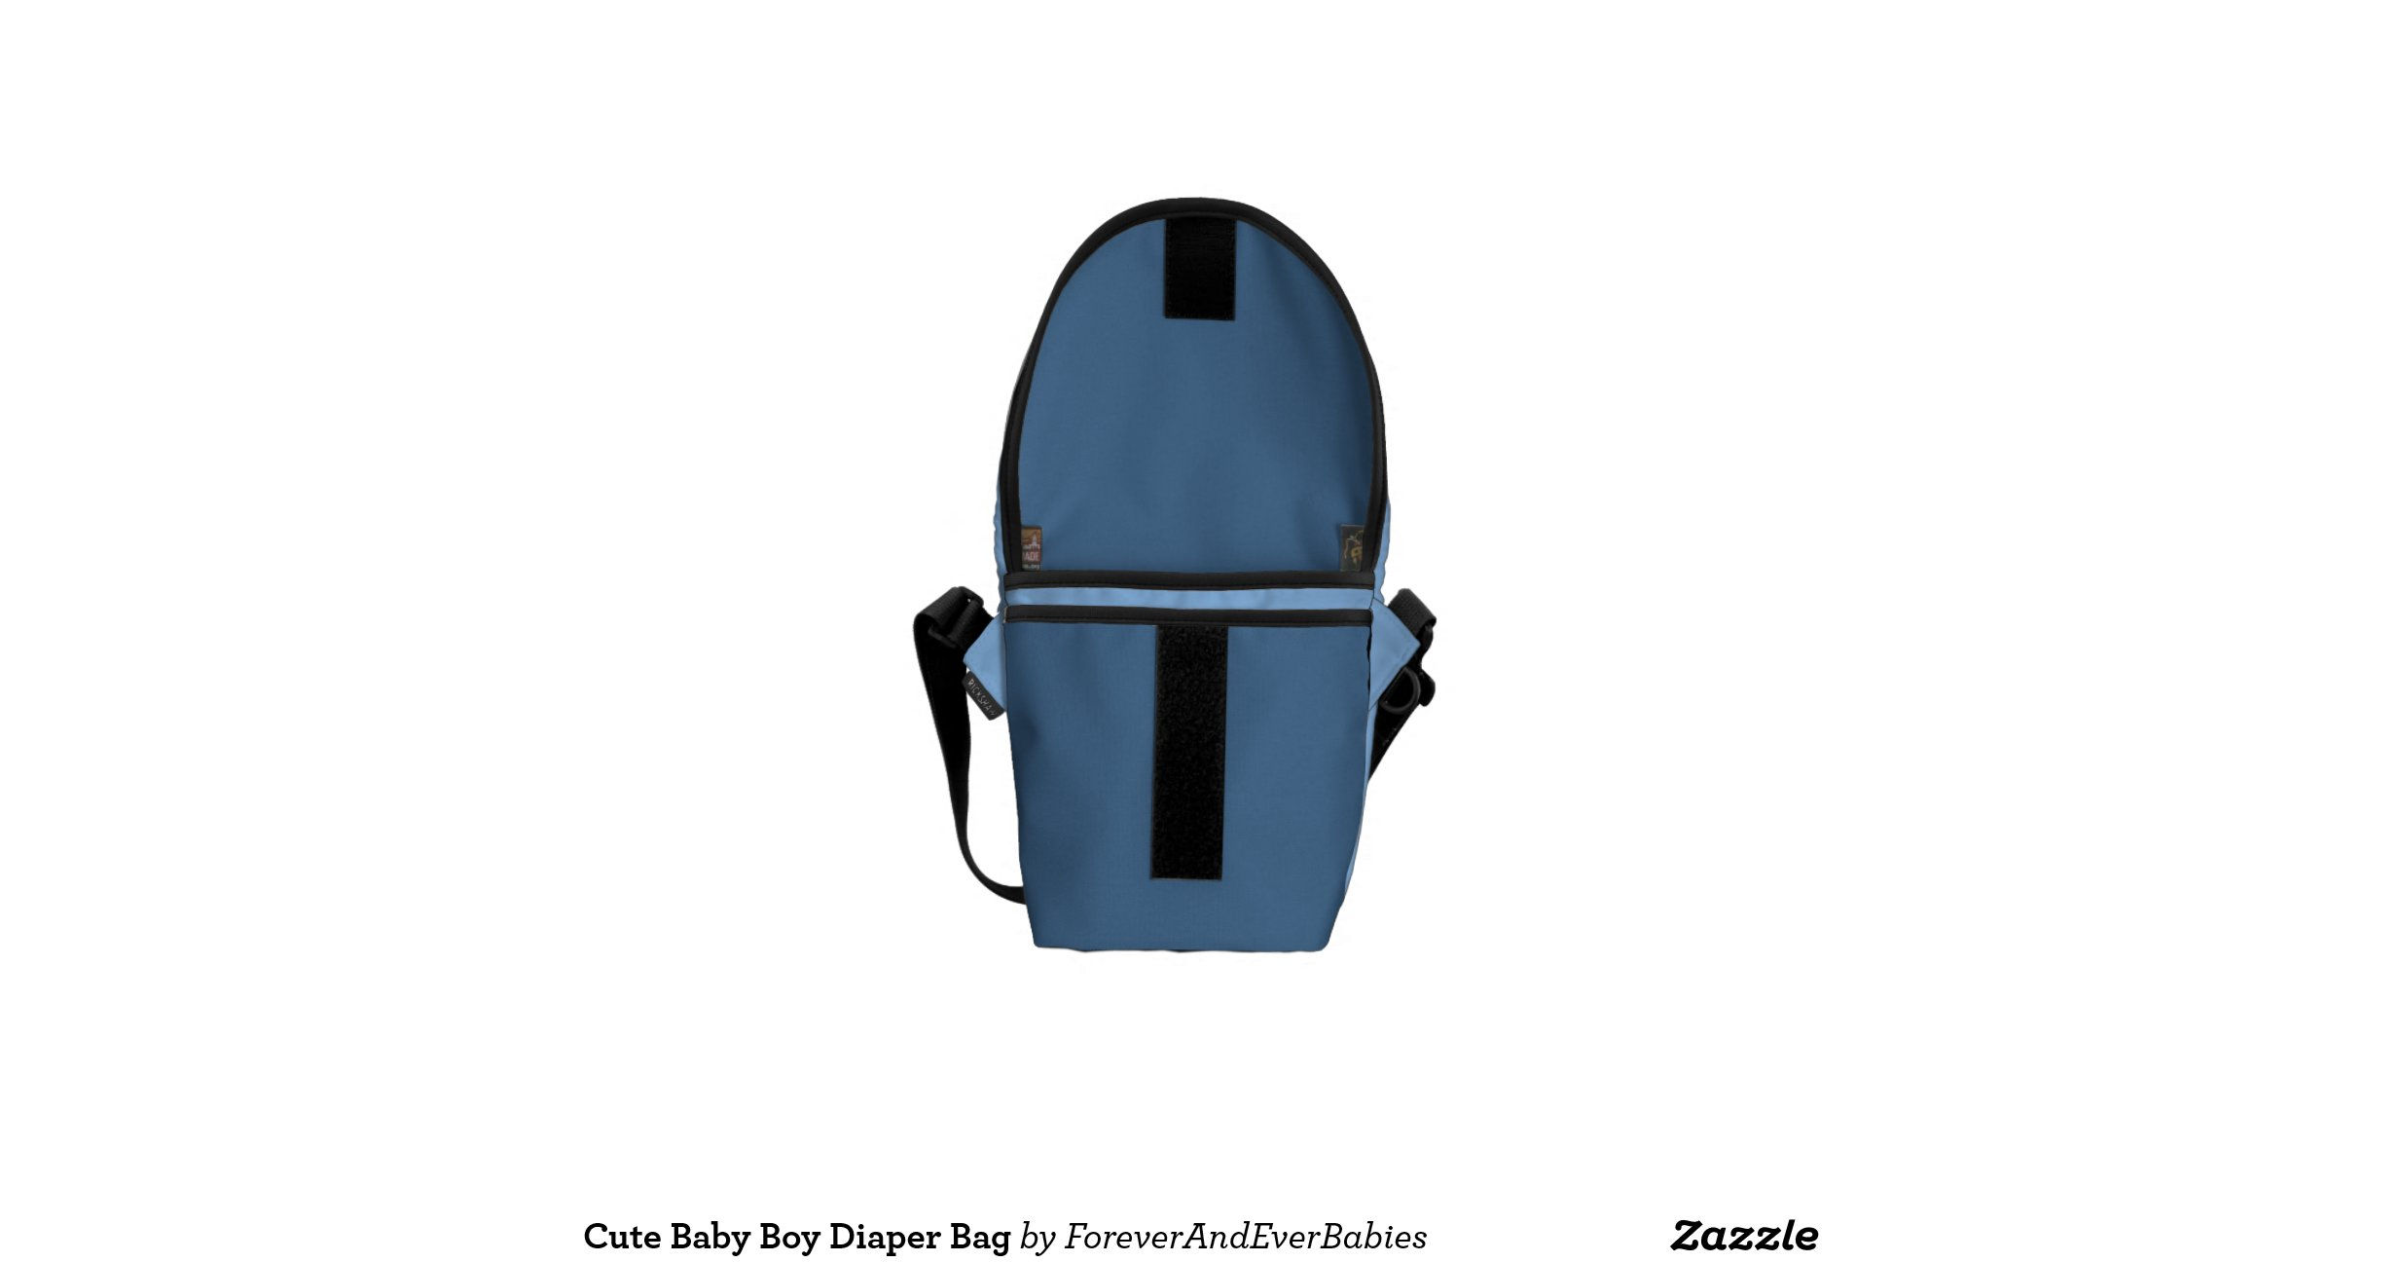 cute baby boy diaper bag courier bags zazzle. Black Bedroom Furniture Sets. Home Design Ideas